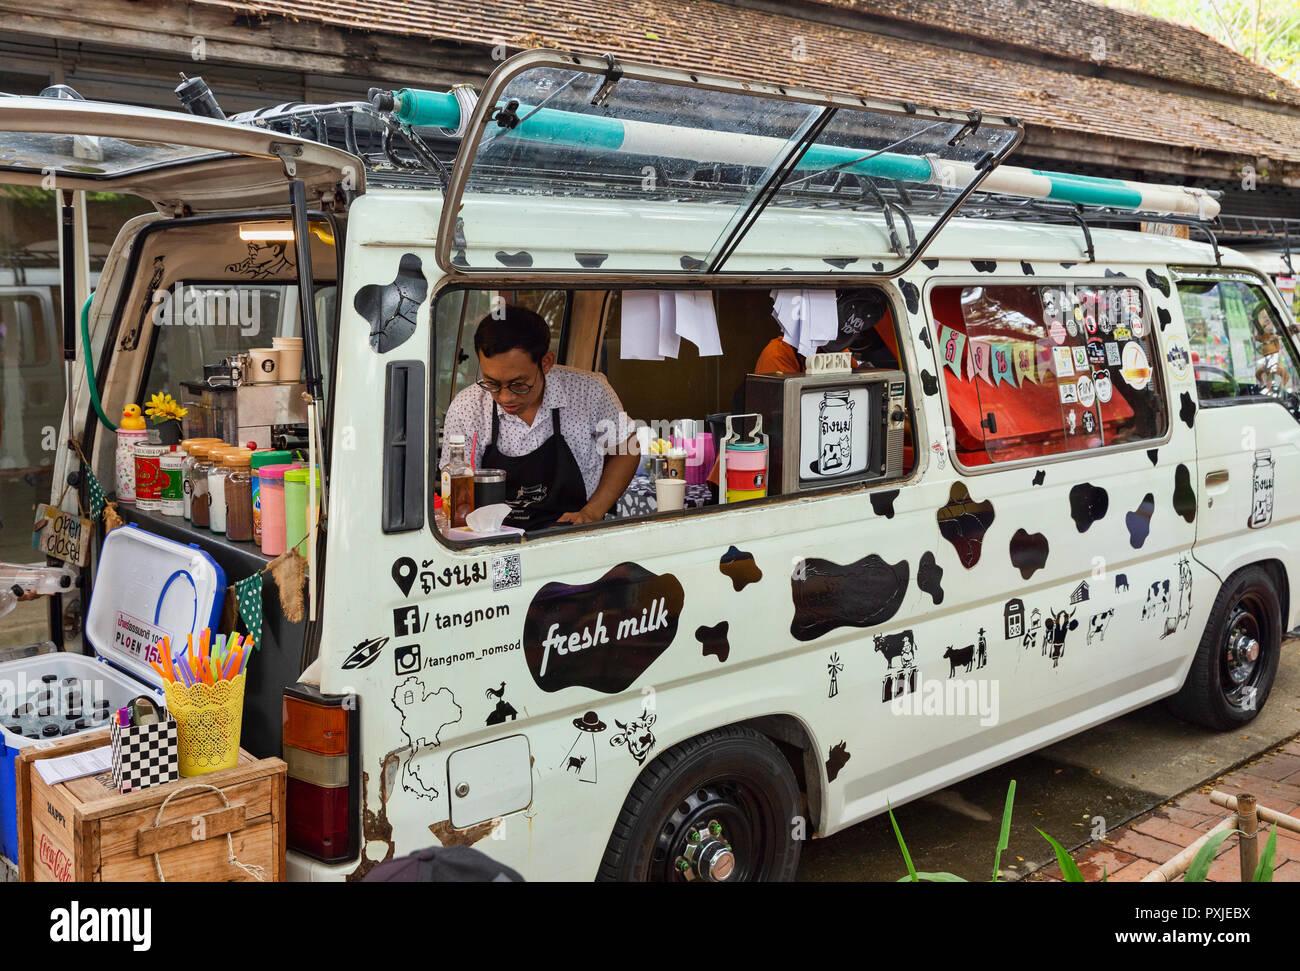 Van converted to mobile coffee shop at JingJai Farmer's Market, Chiang Mai, Thailand - Stock Image